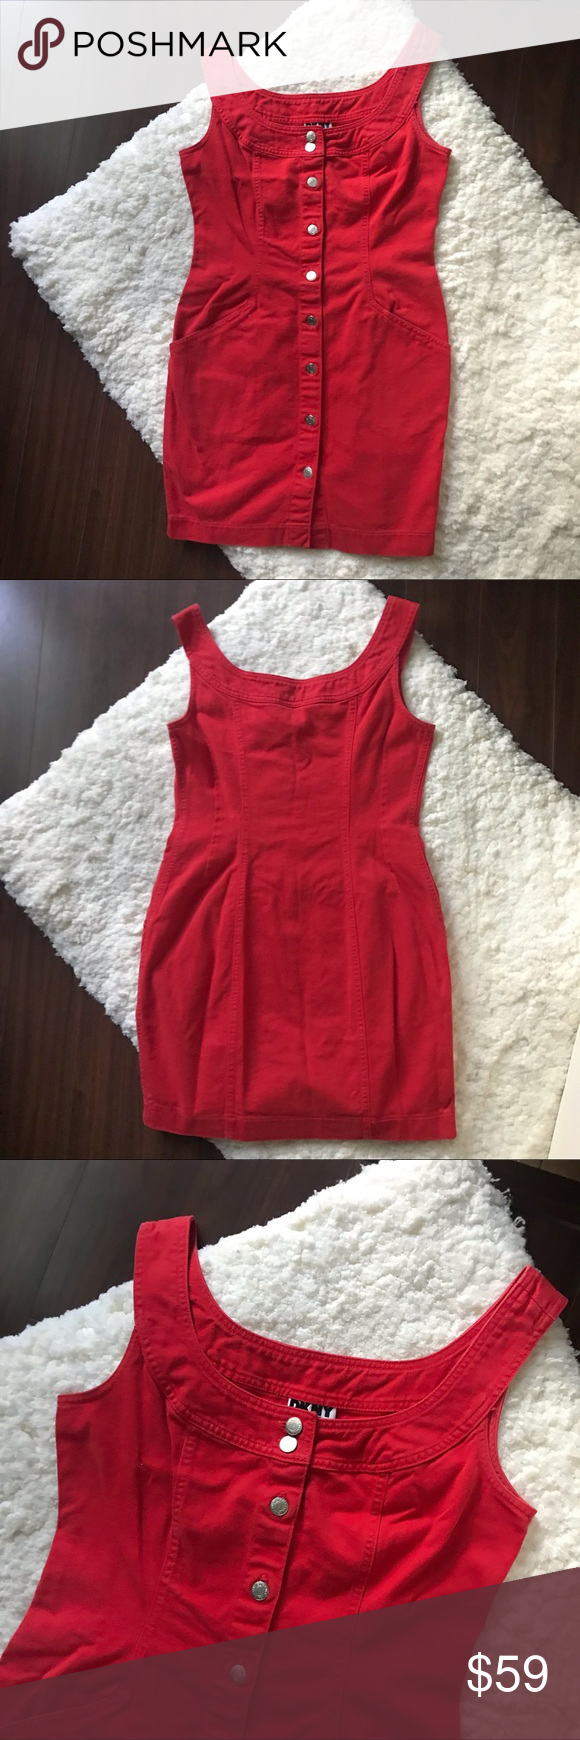 DKNY Dress Circa 1990/'s